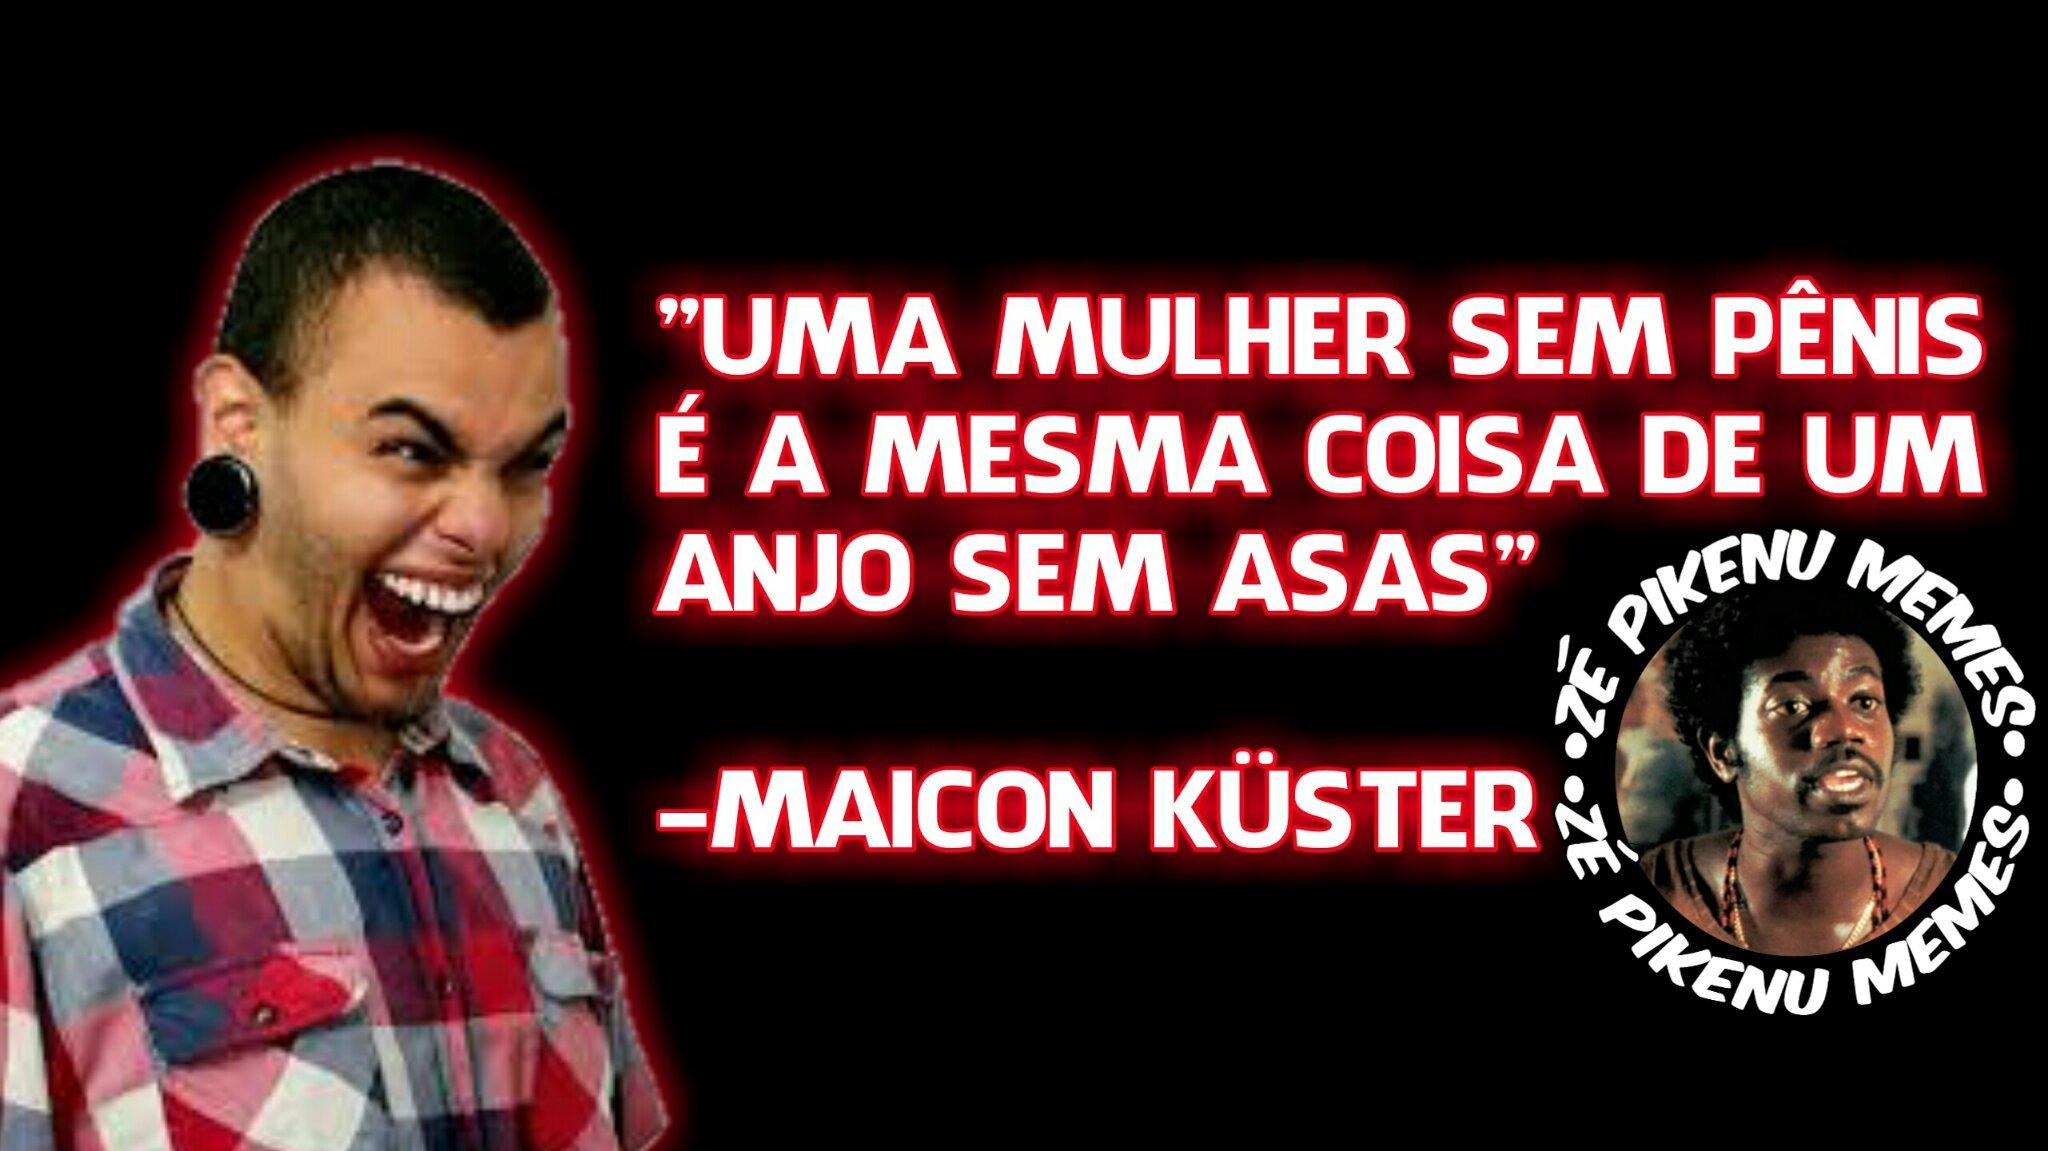 O Maicon Küster é foda kkkkk - meme